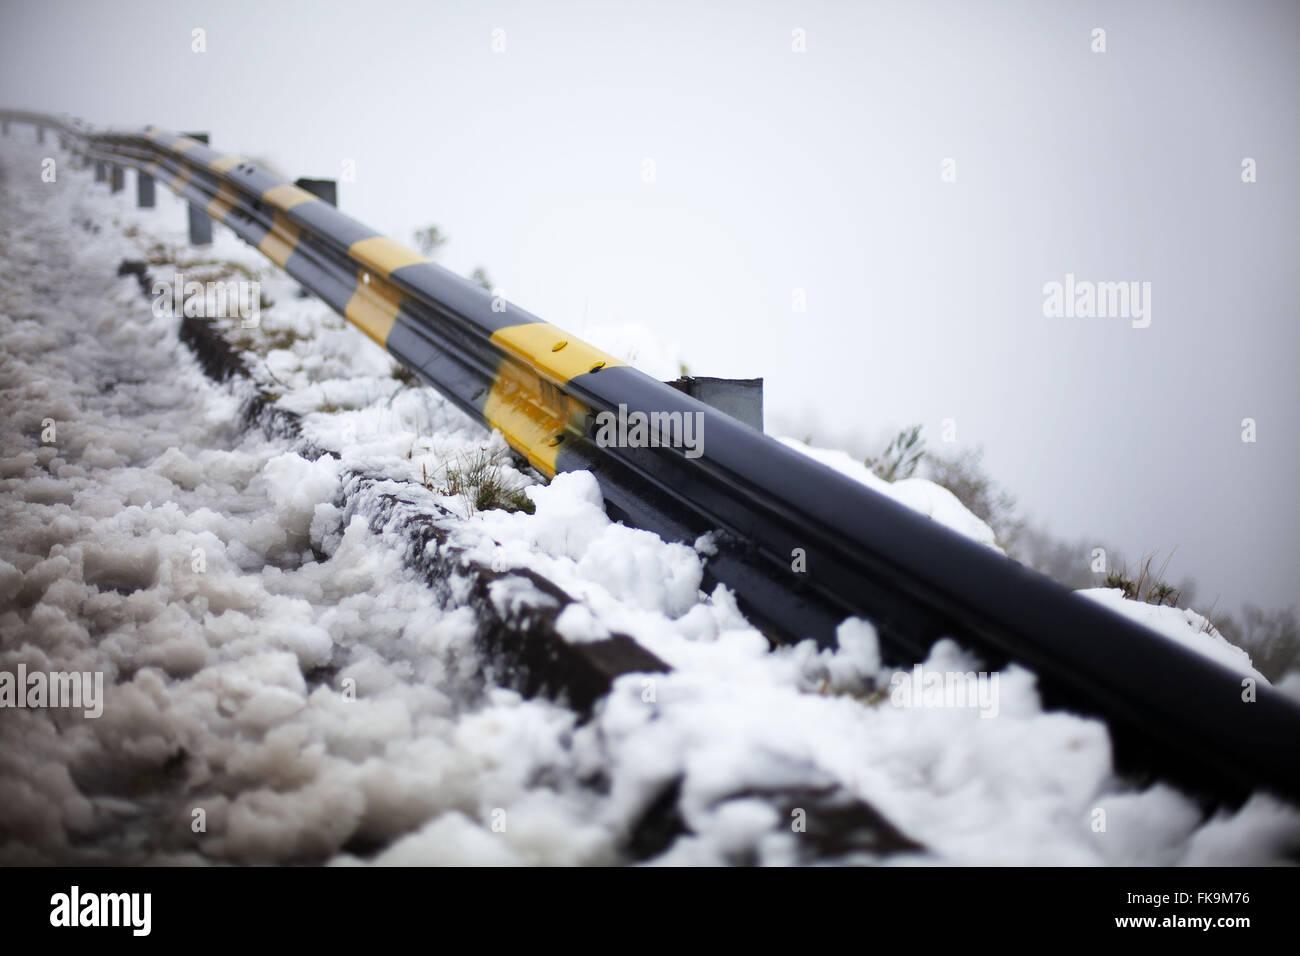 Snow in Urubici - Guard Rail Road SC - 439 Church Hill City Urubici - Stock Image